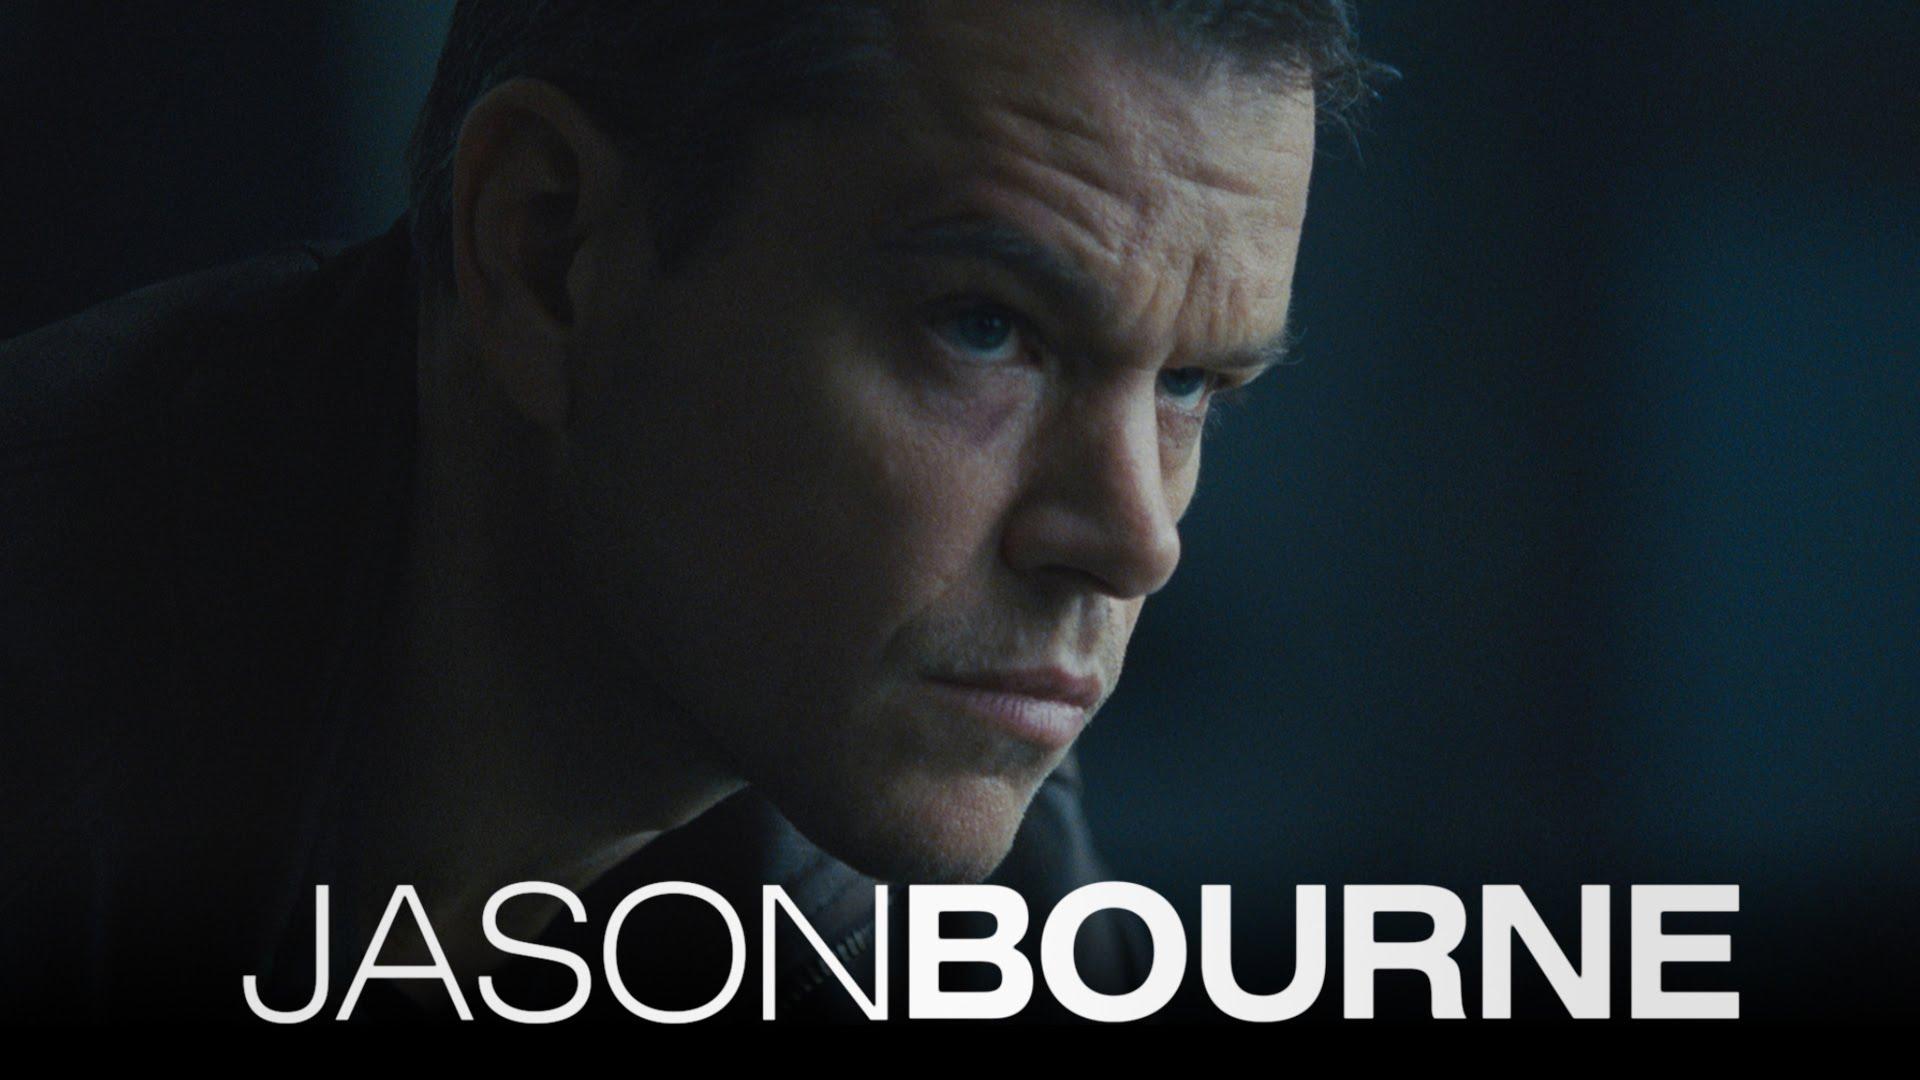 JASON BOURNE - First Look